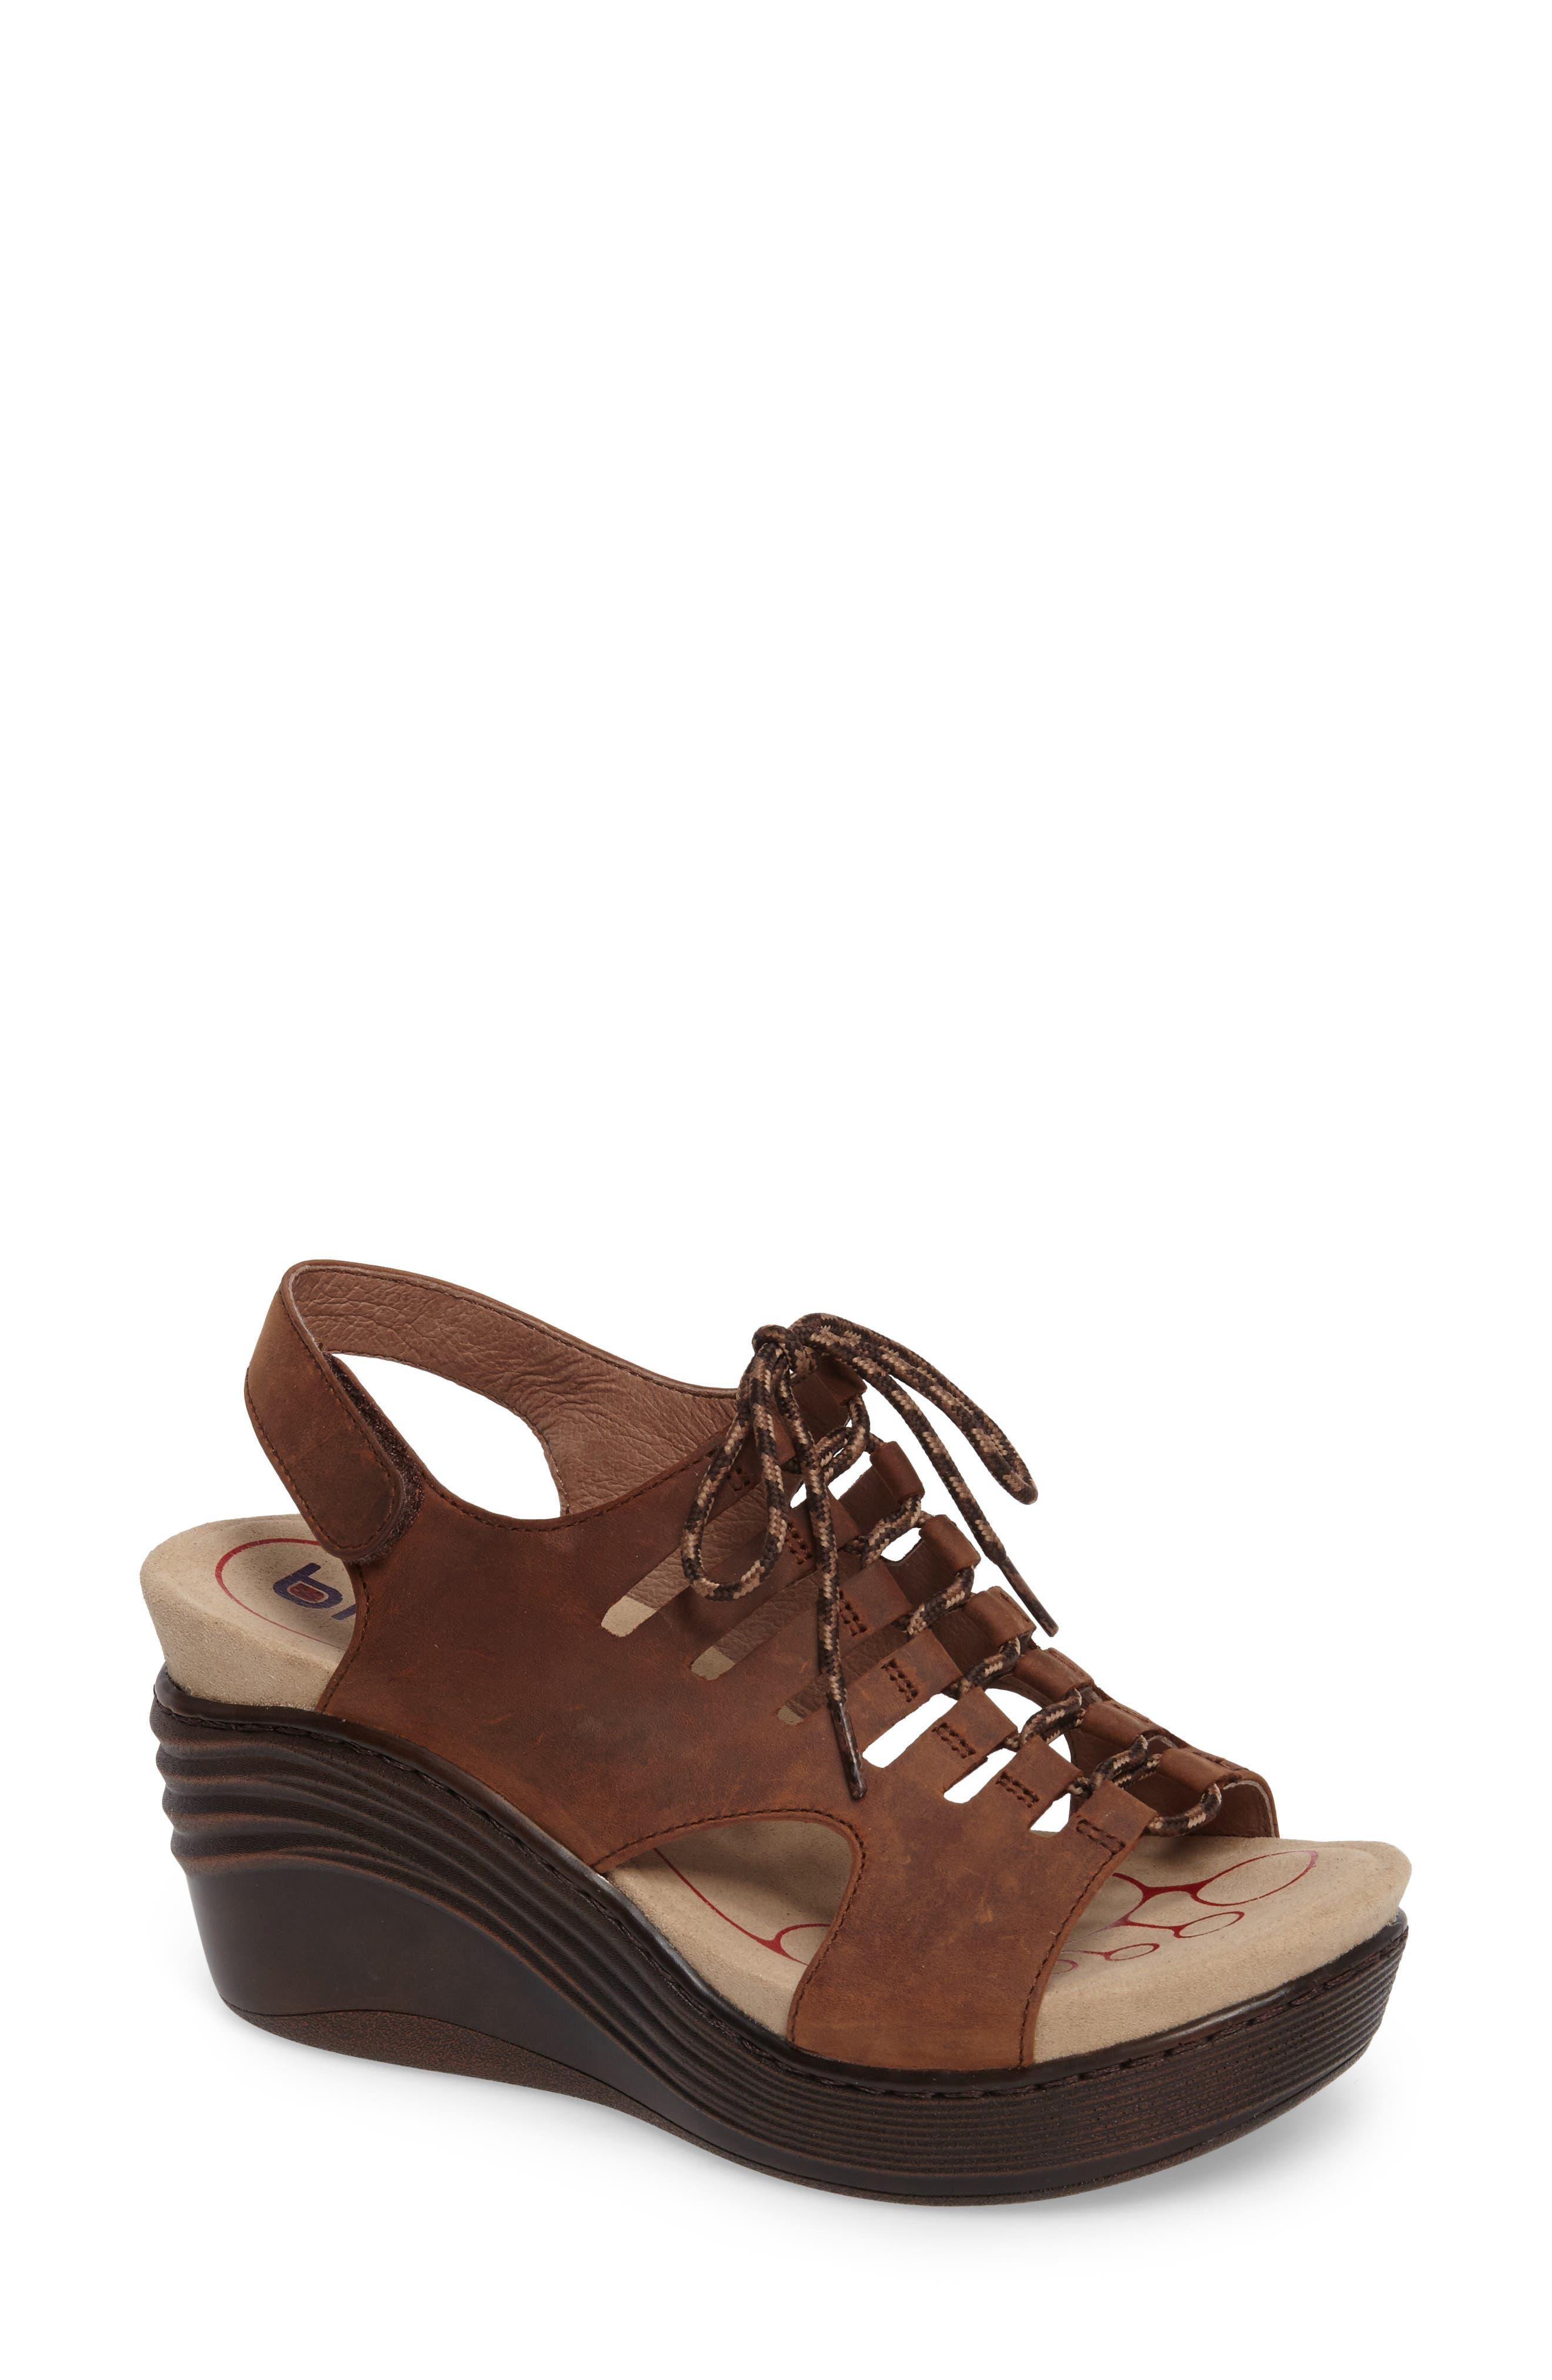 Alternate Image 1 Selected - BIONICA Sirus Wedge Sandal (Women)